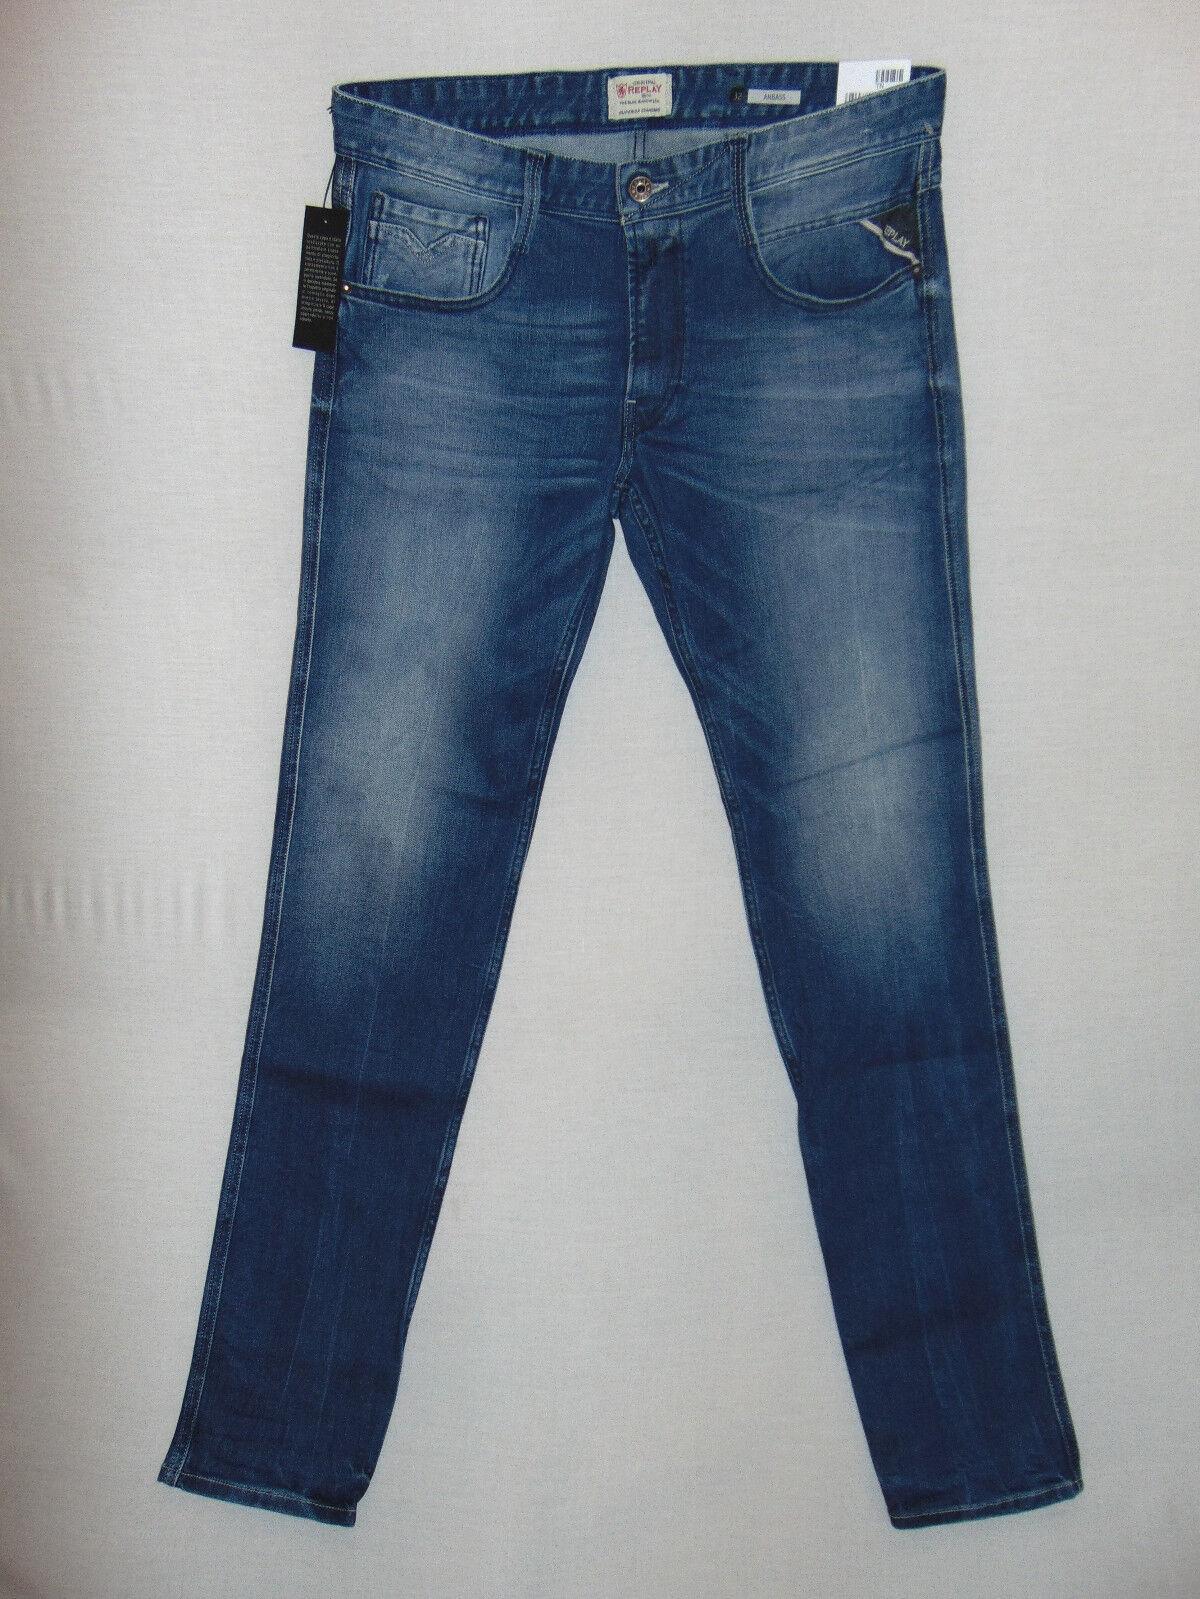 Replay ANBASS Stretch Slim Fit  RRP  Mens 12oz Deep bluee Comfort Denim Jeans